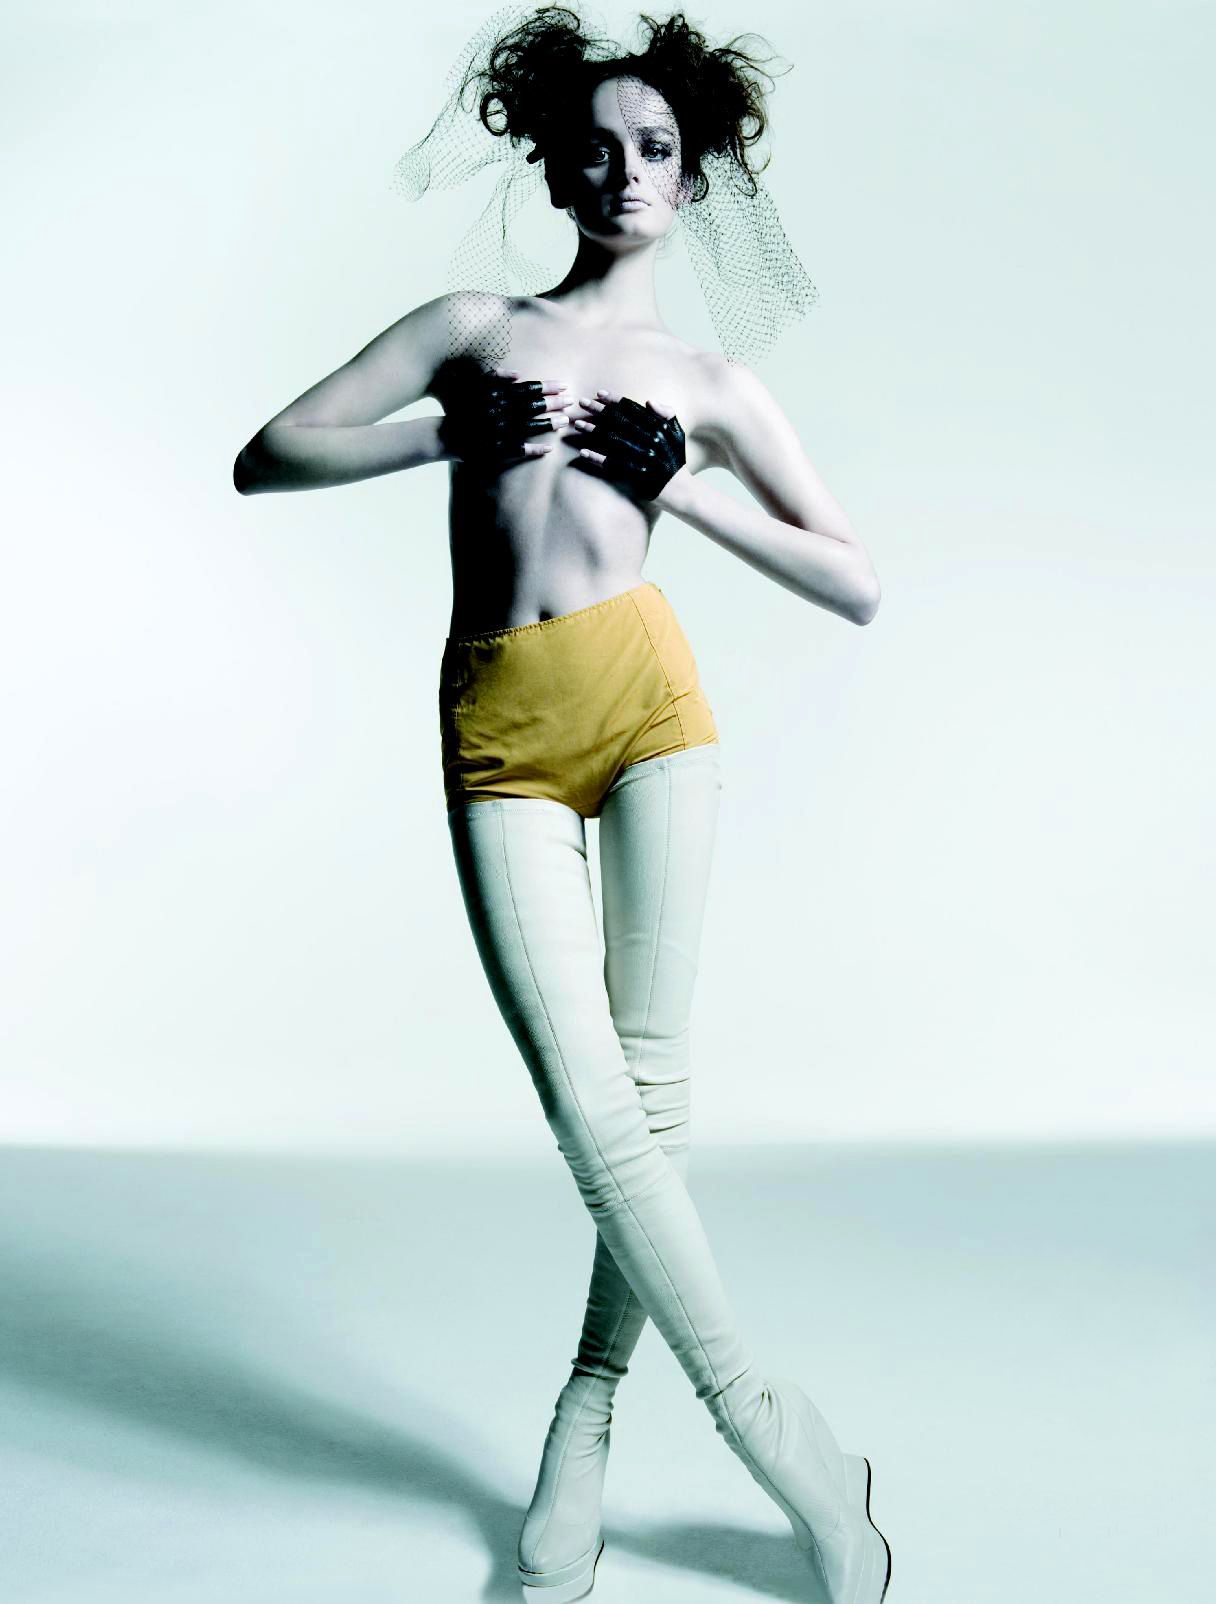 30b7513350c Boot Fashion: Lisa Cant in Maison Martin Margiela Crotch High Boots ...